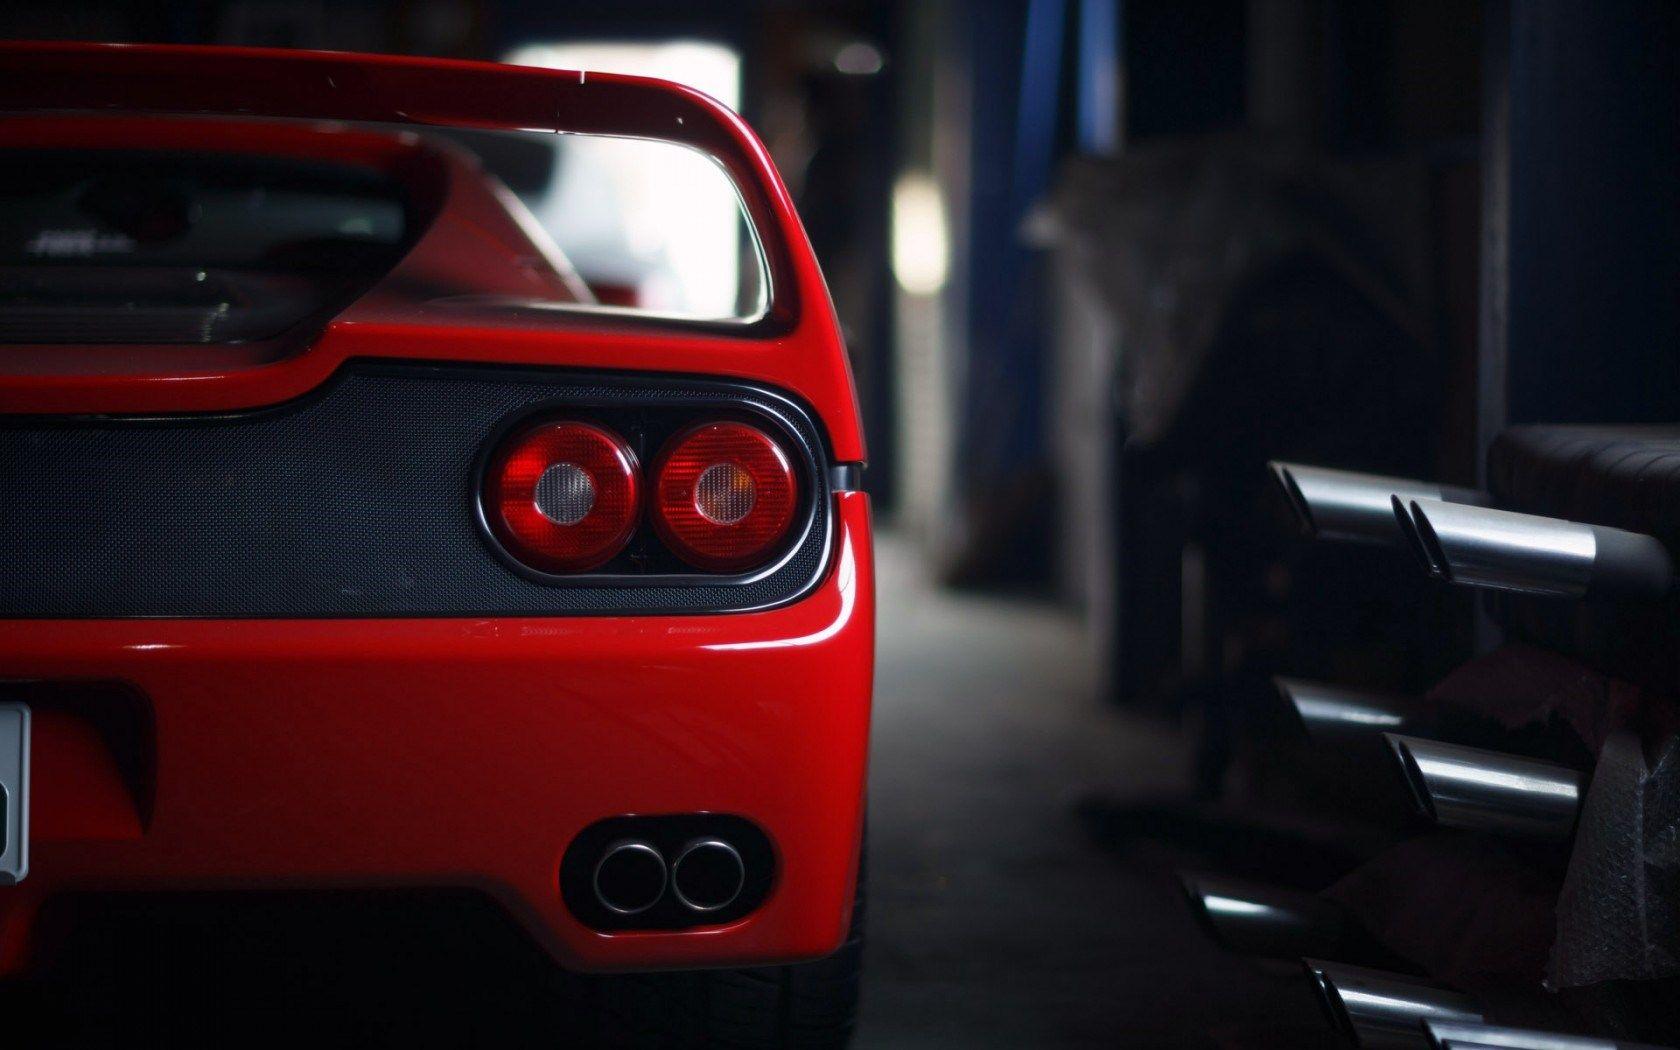 LaFerrari | Schnell List | Car Exterrior | Pinterest | Ferrari and Cars